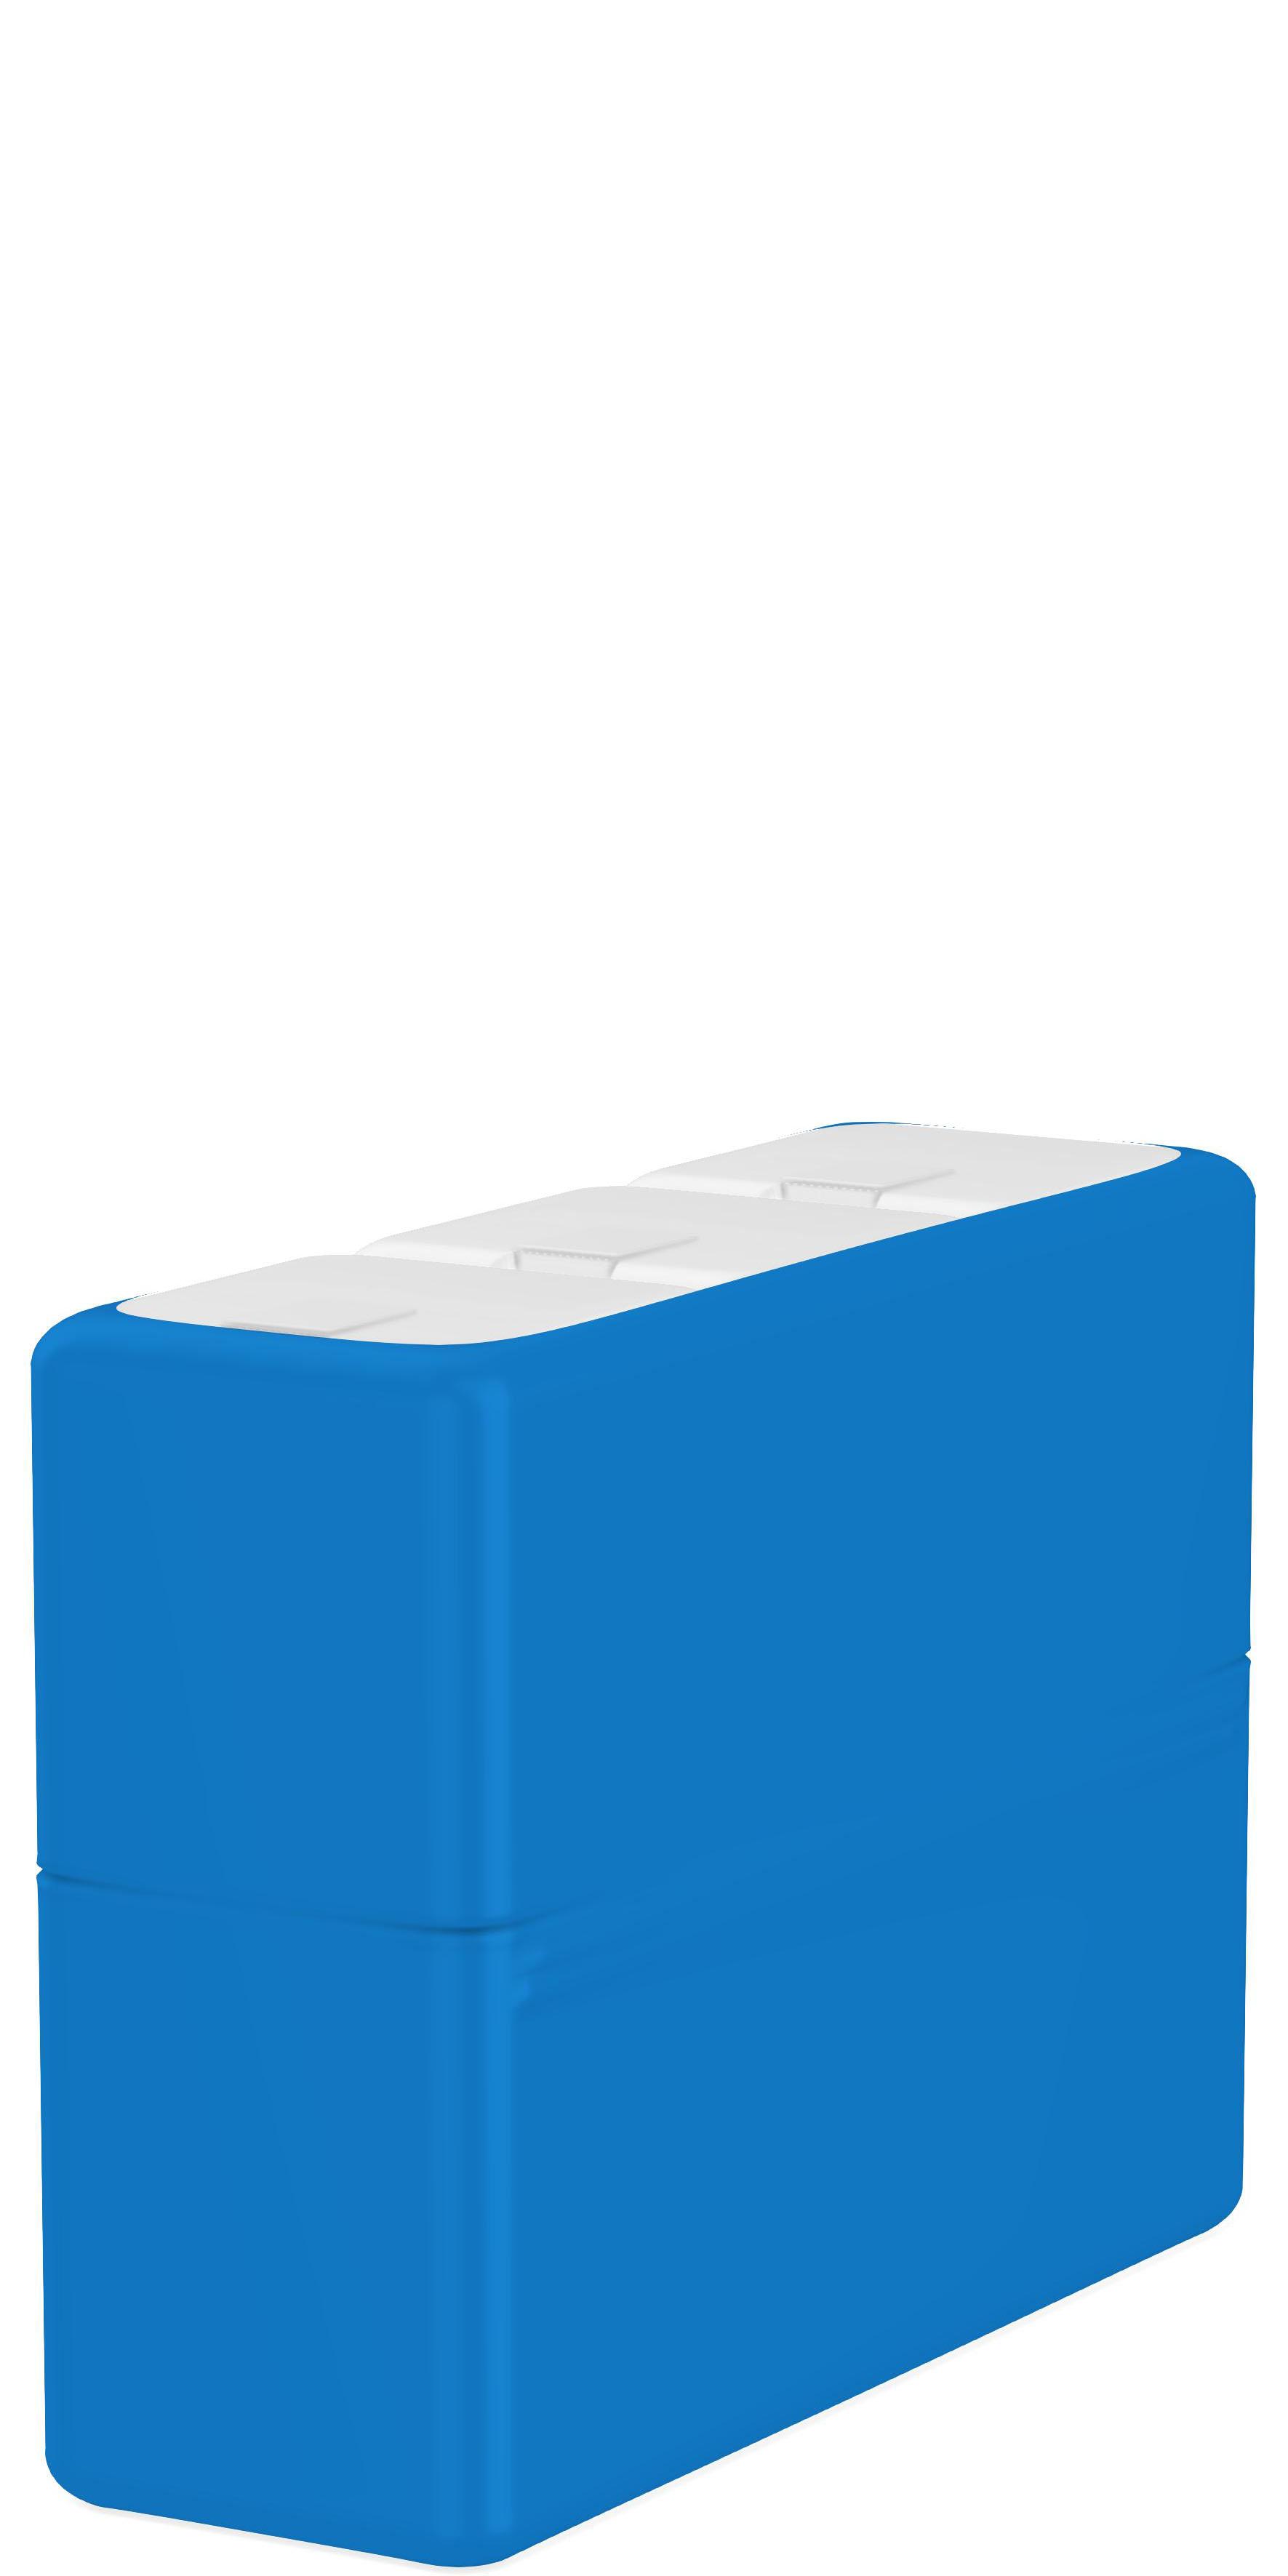 Forme emballage Produits douche & bain 250ml en lot